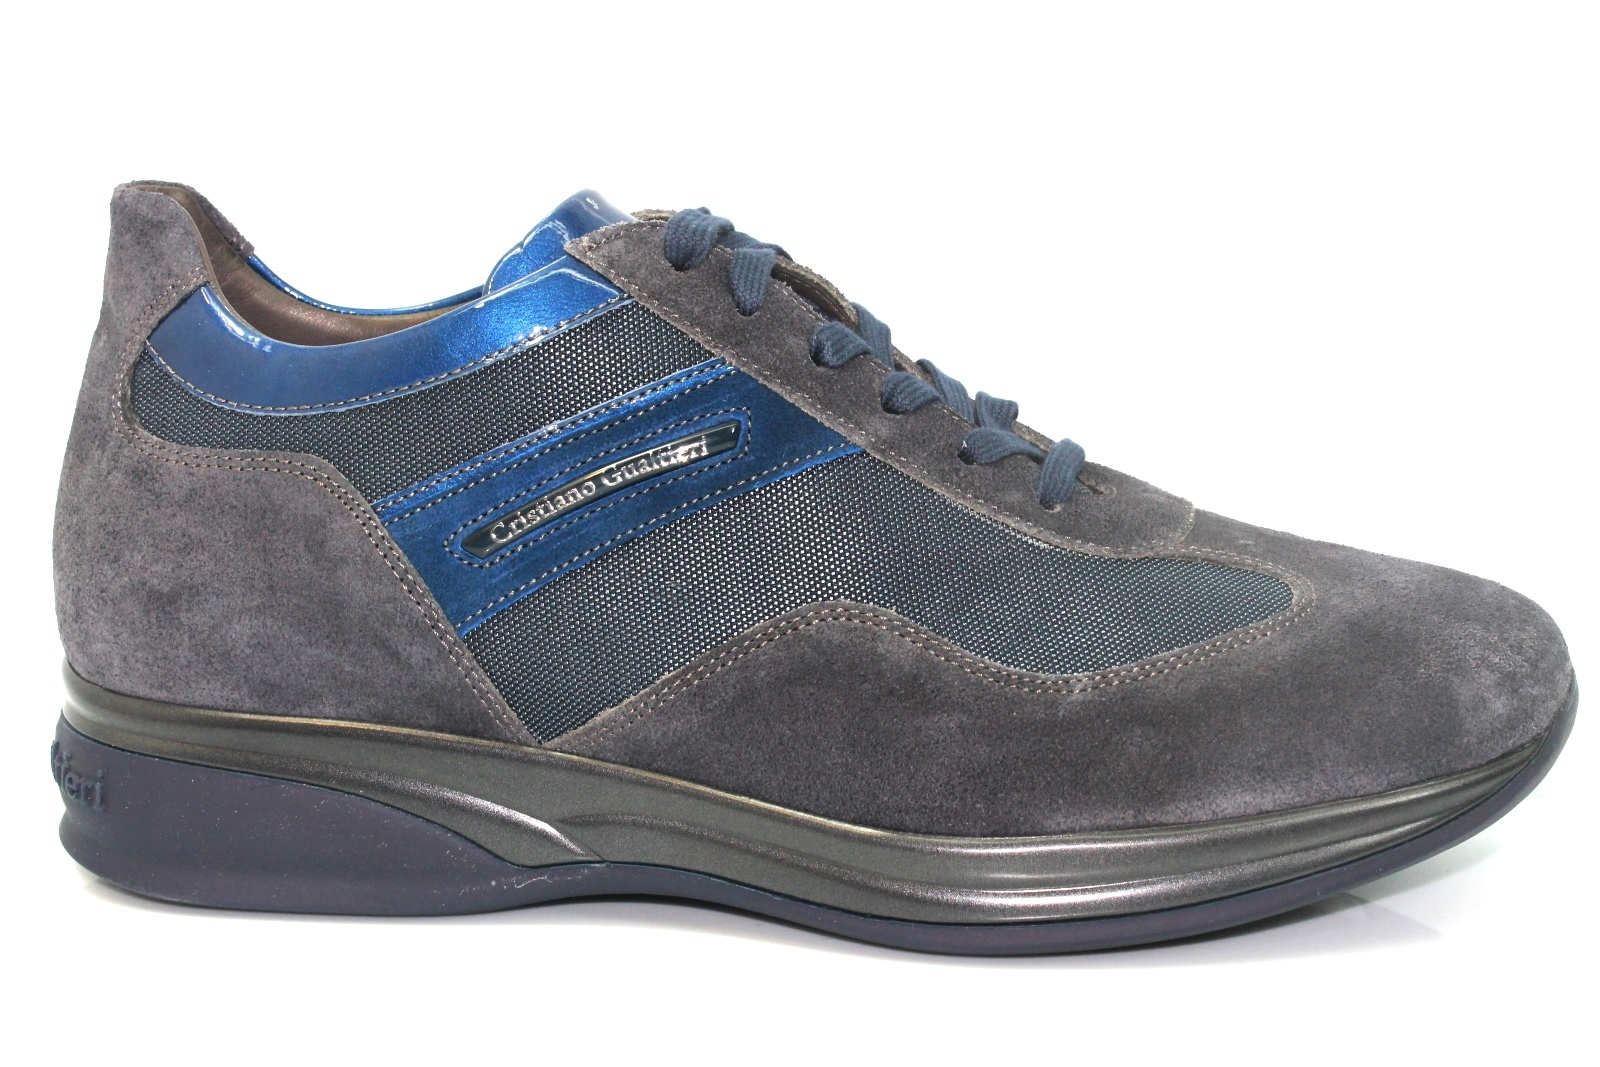 728160b9c1 Cristiano gualtieri scarpe - offerte e risparmia su Ondausu